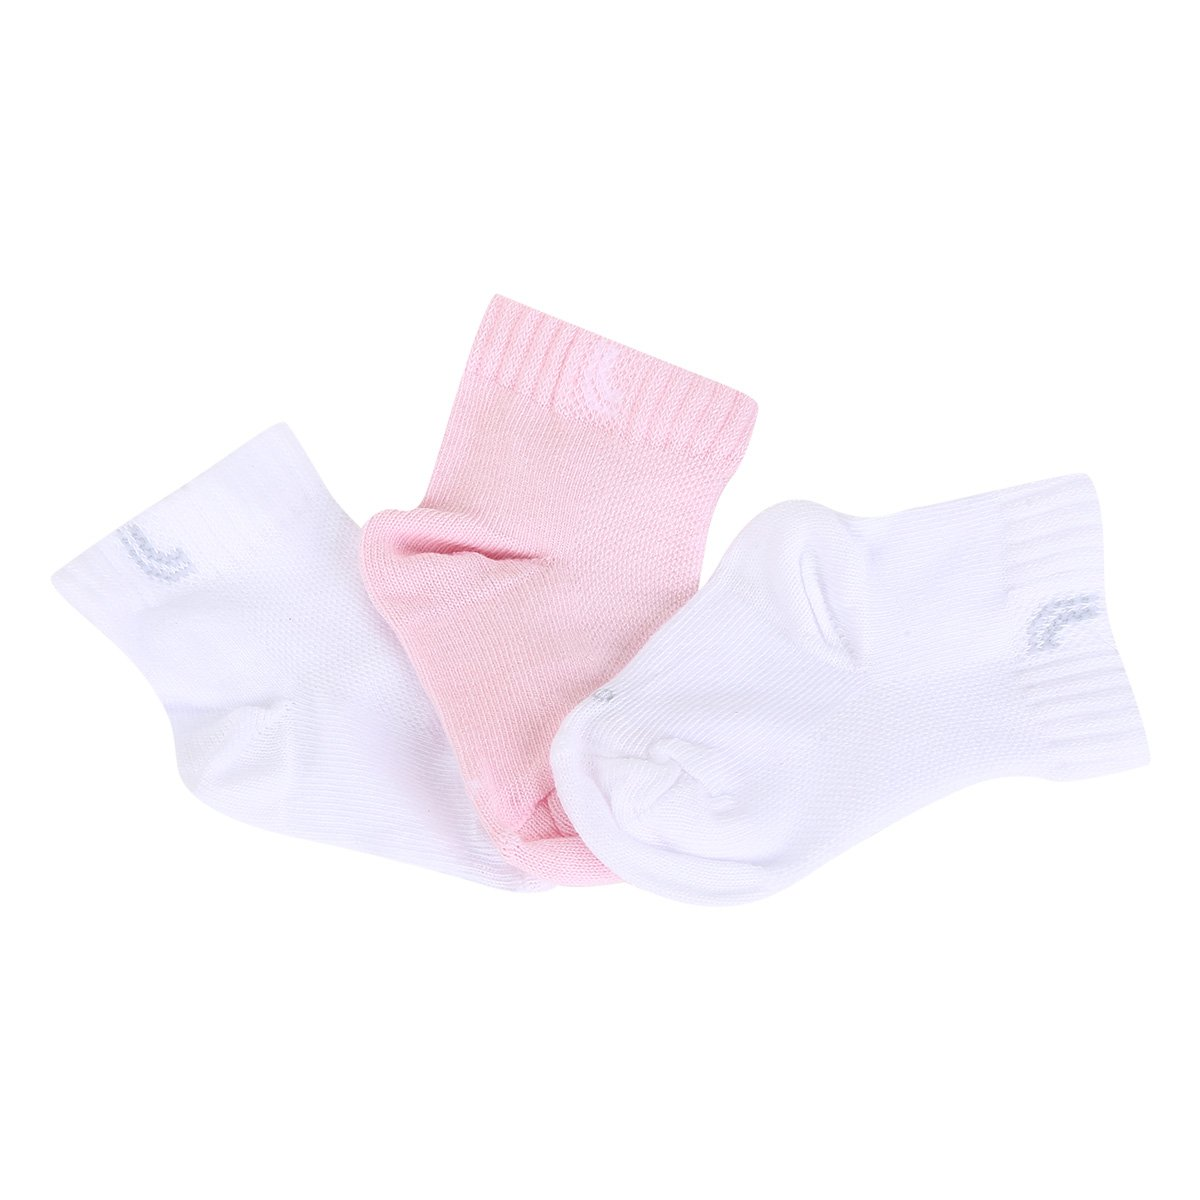 Kit Meia Infantil Lupo Baby Punho Soft Cano Médio 3 Pares